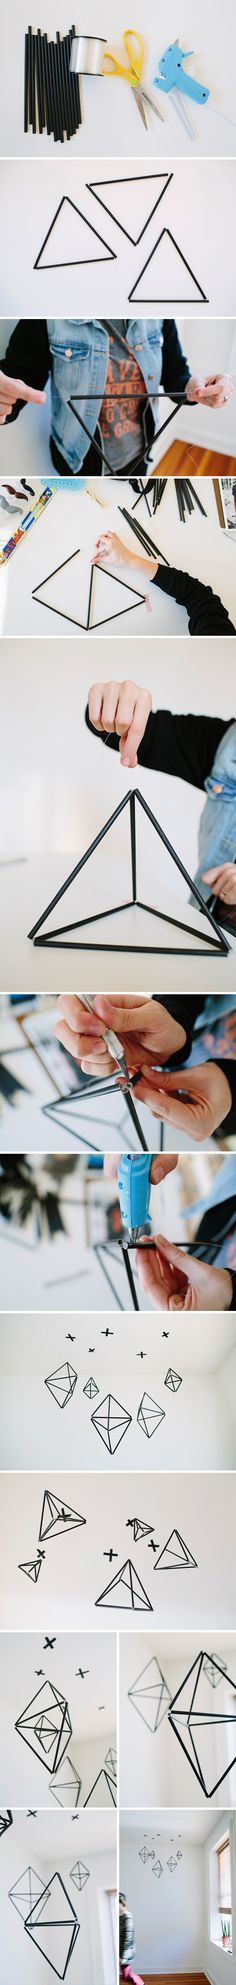 DIY -- Geometric Straw Mobile